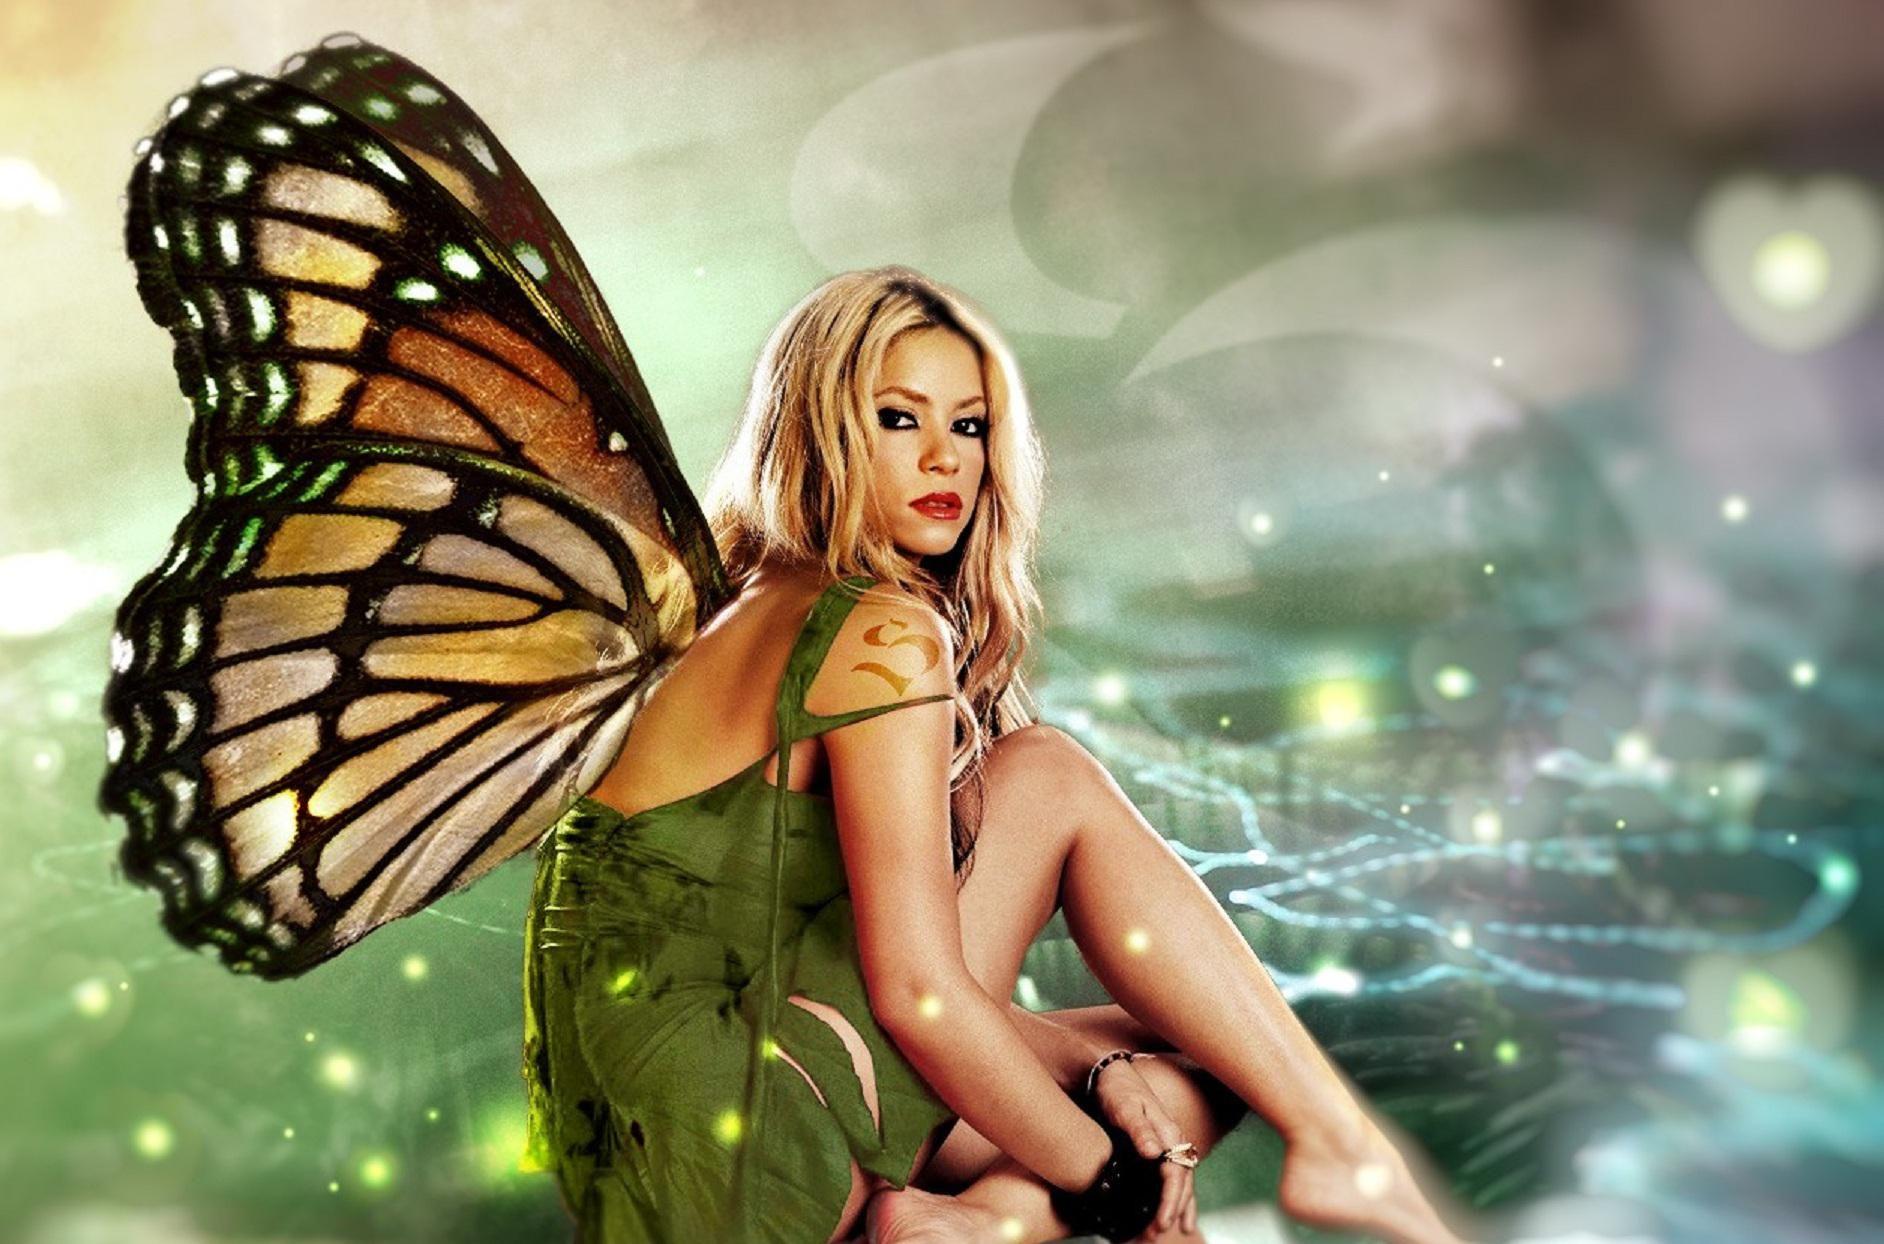 Shakira as Butterfly. MK Ultra Project MONARCH symbolism ...